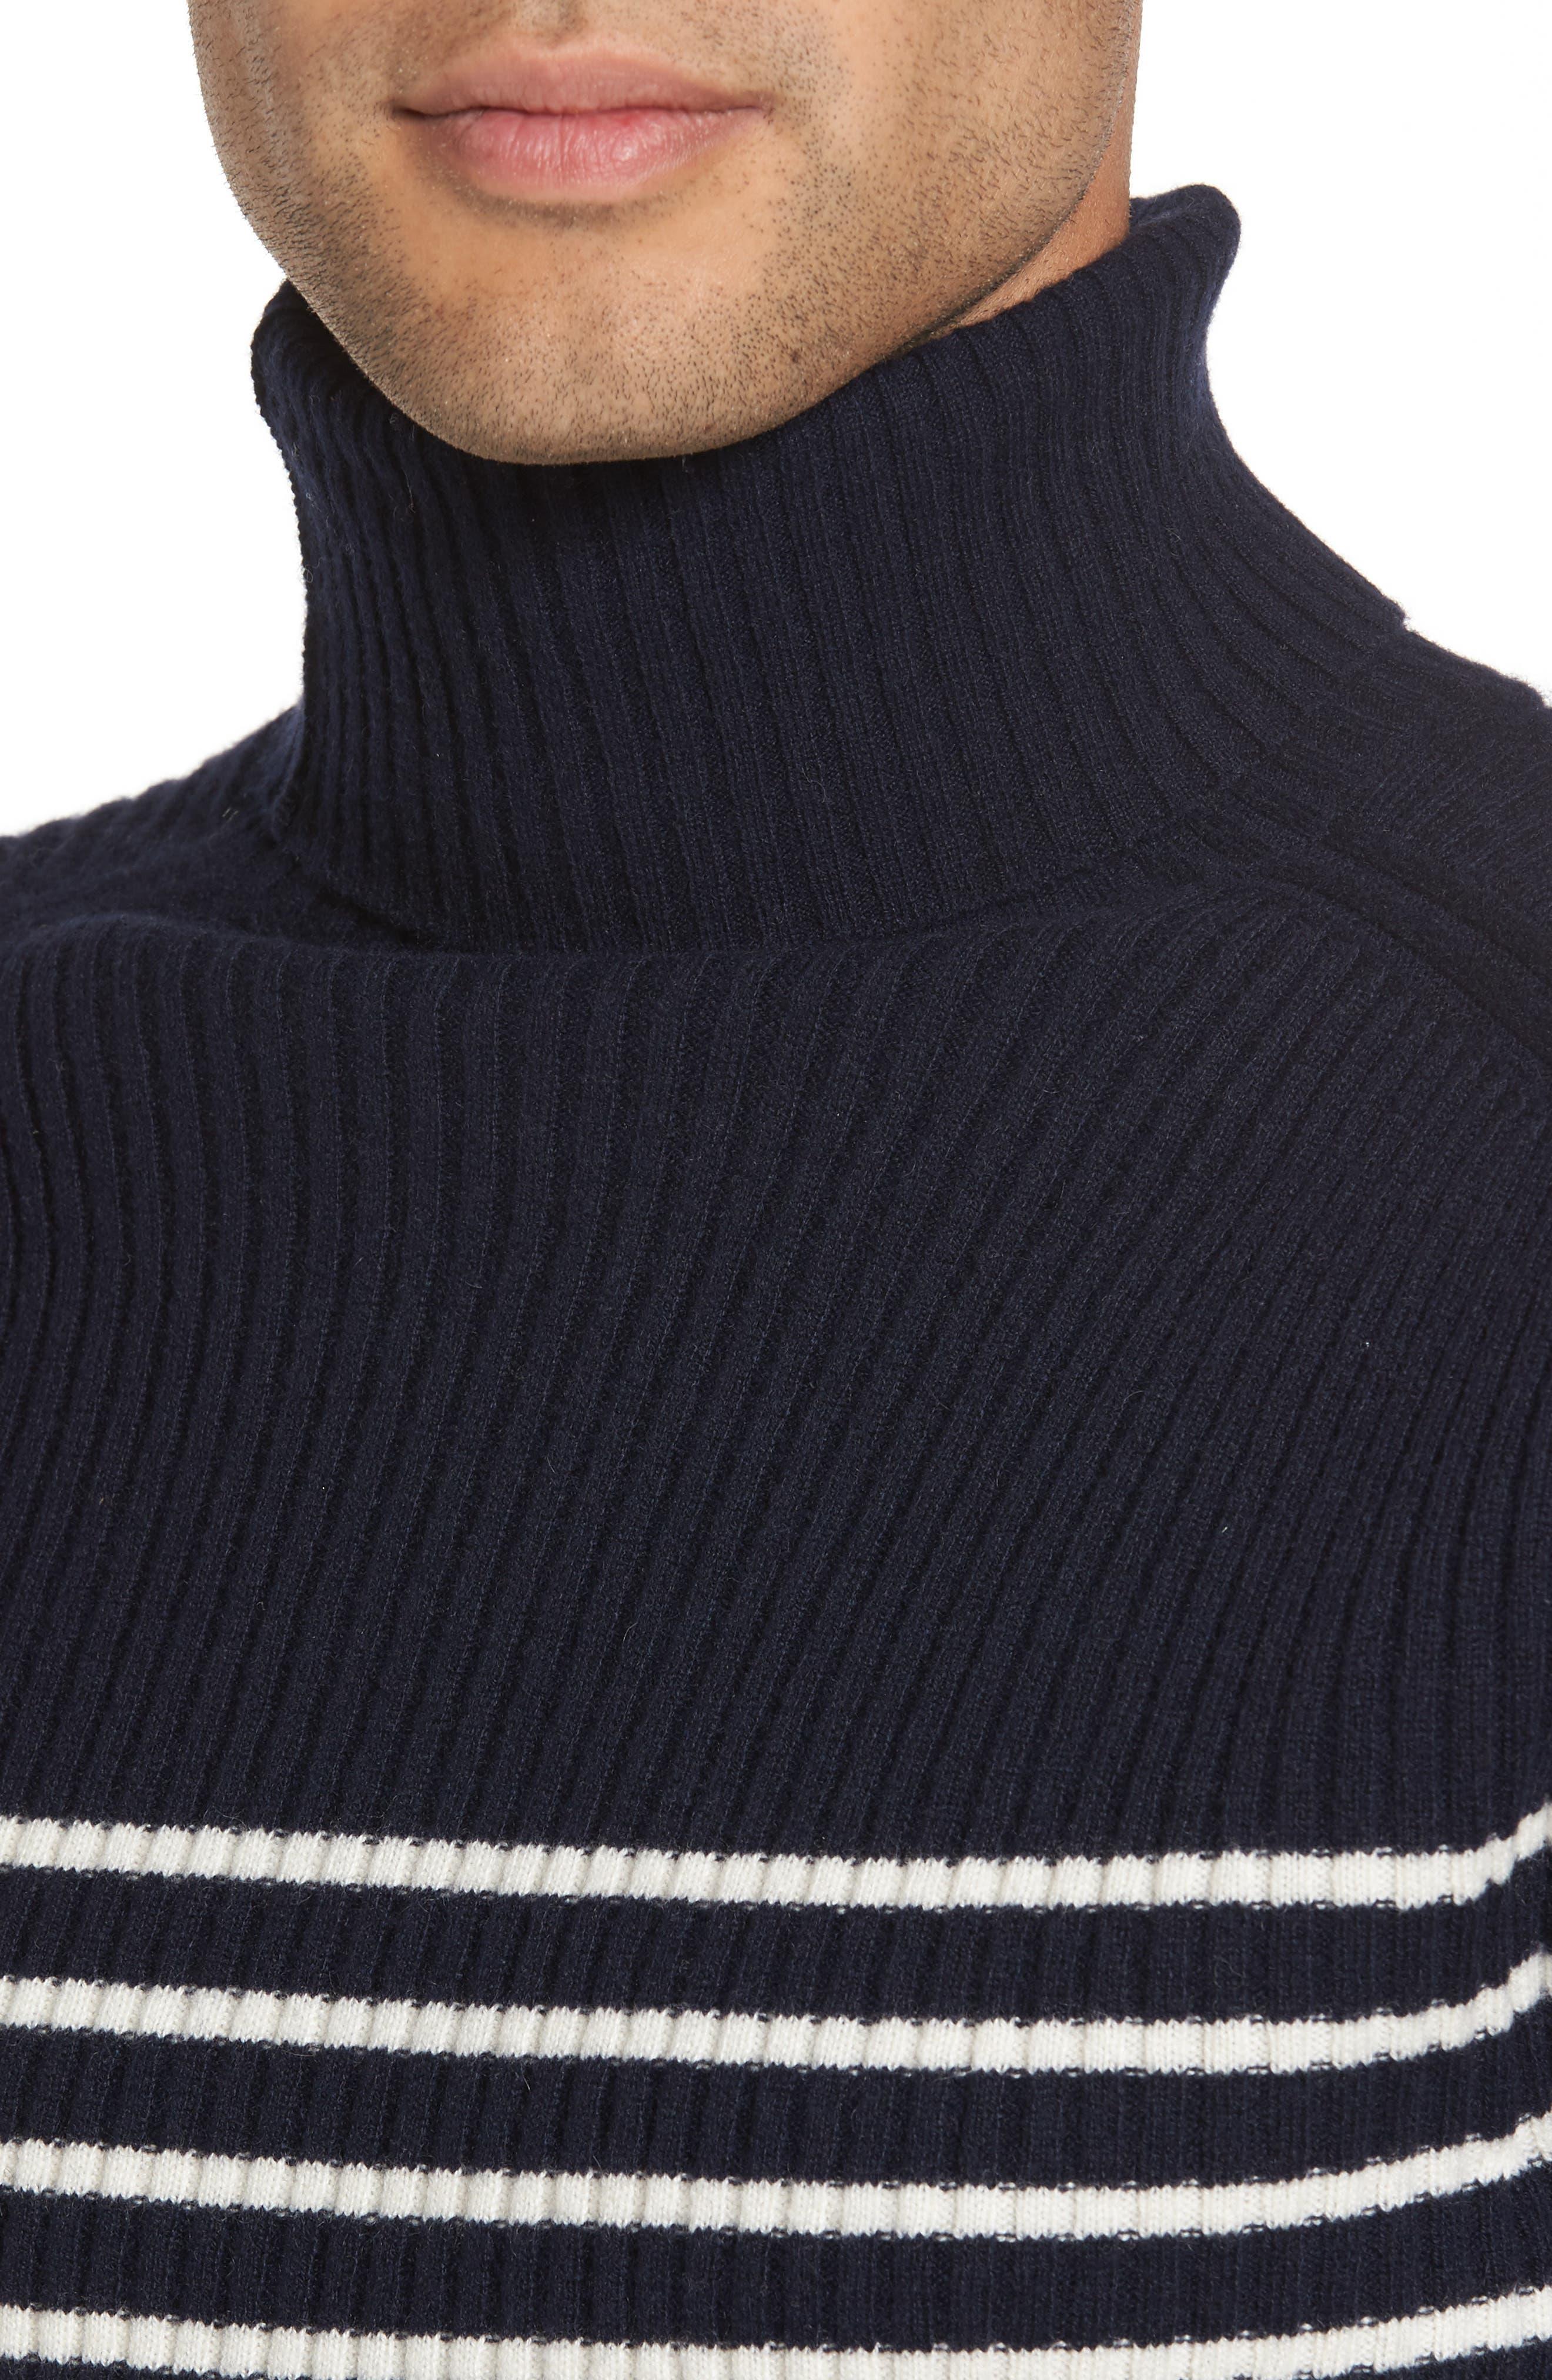 Regular Fit Breton Stripe Cashmere Turtleneck Sweater,                             Alternate thumbnail 4, color,                             Coastal/ Breeze